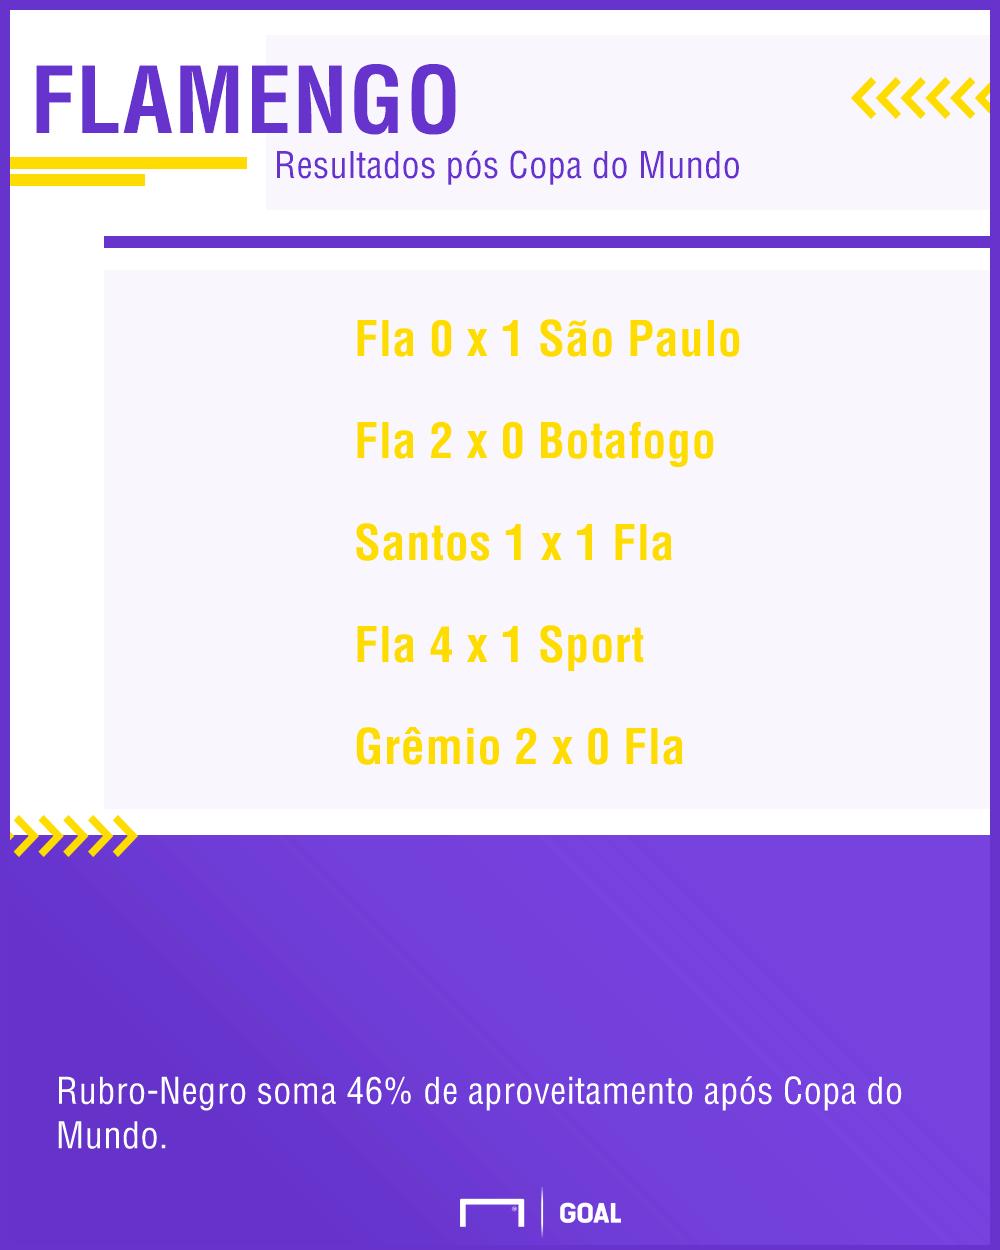 GFX Flamengo pós Copa do Mundo 06/08/2018